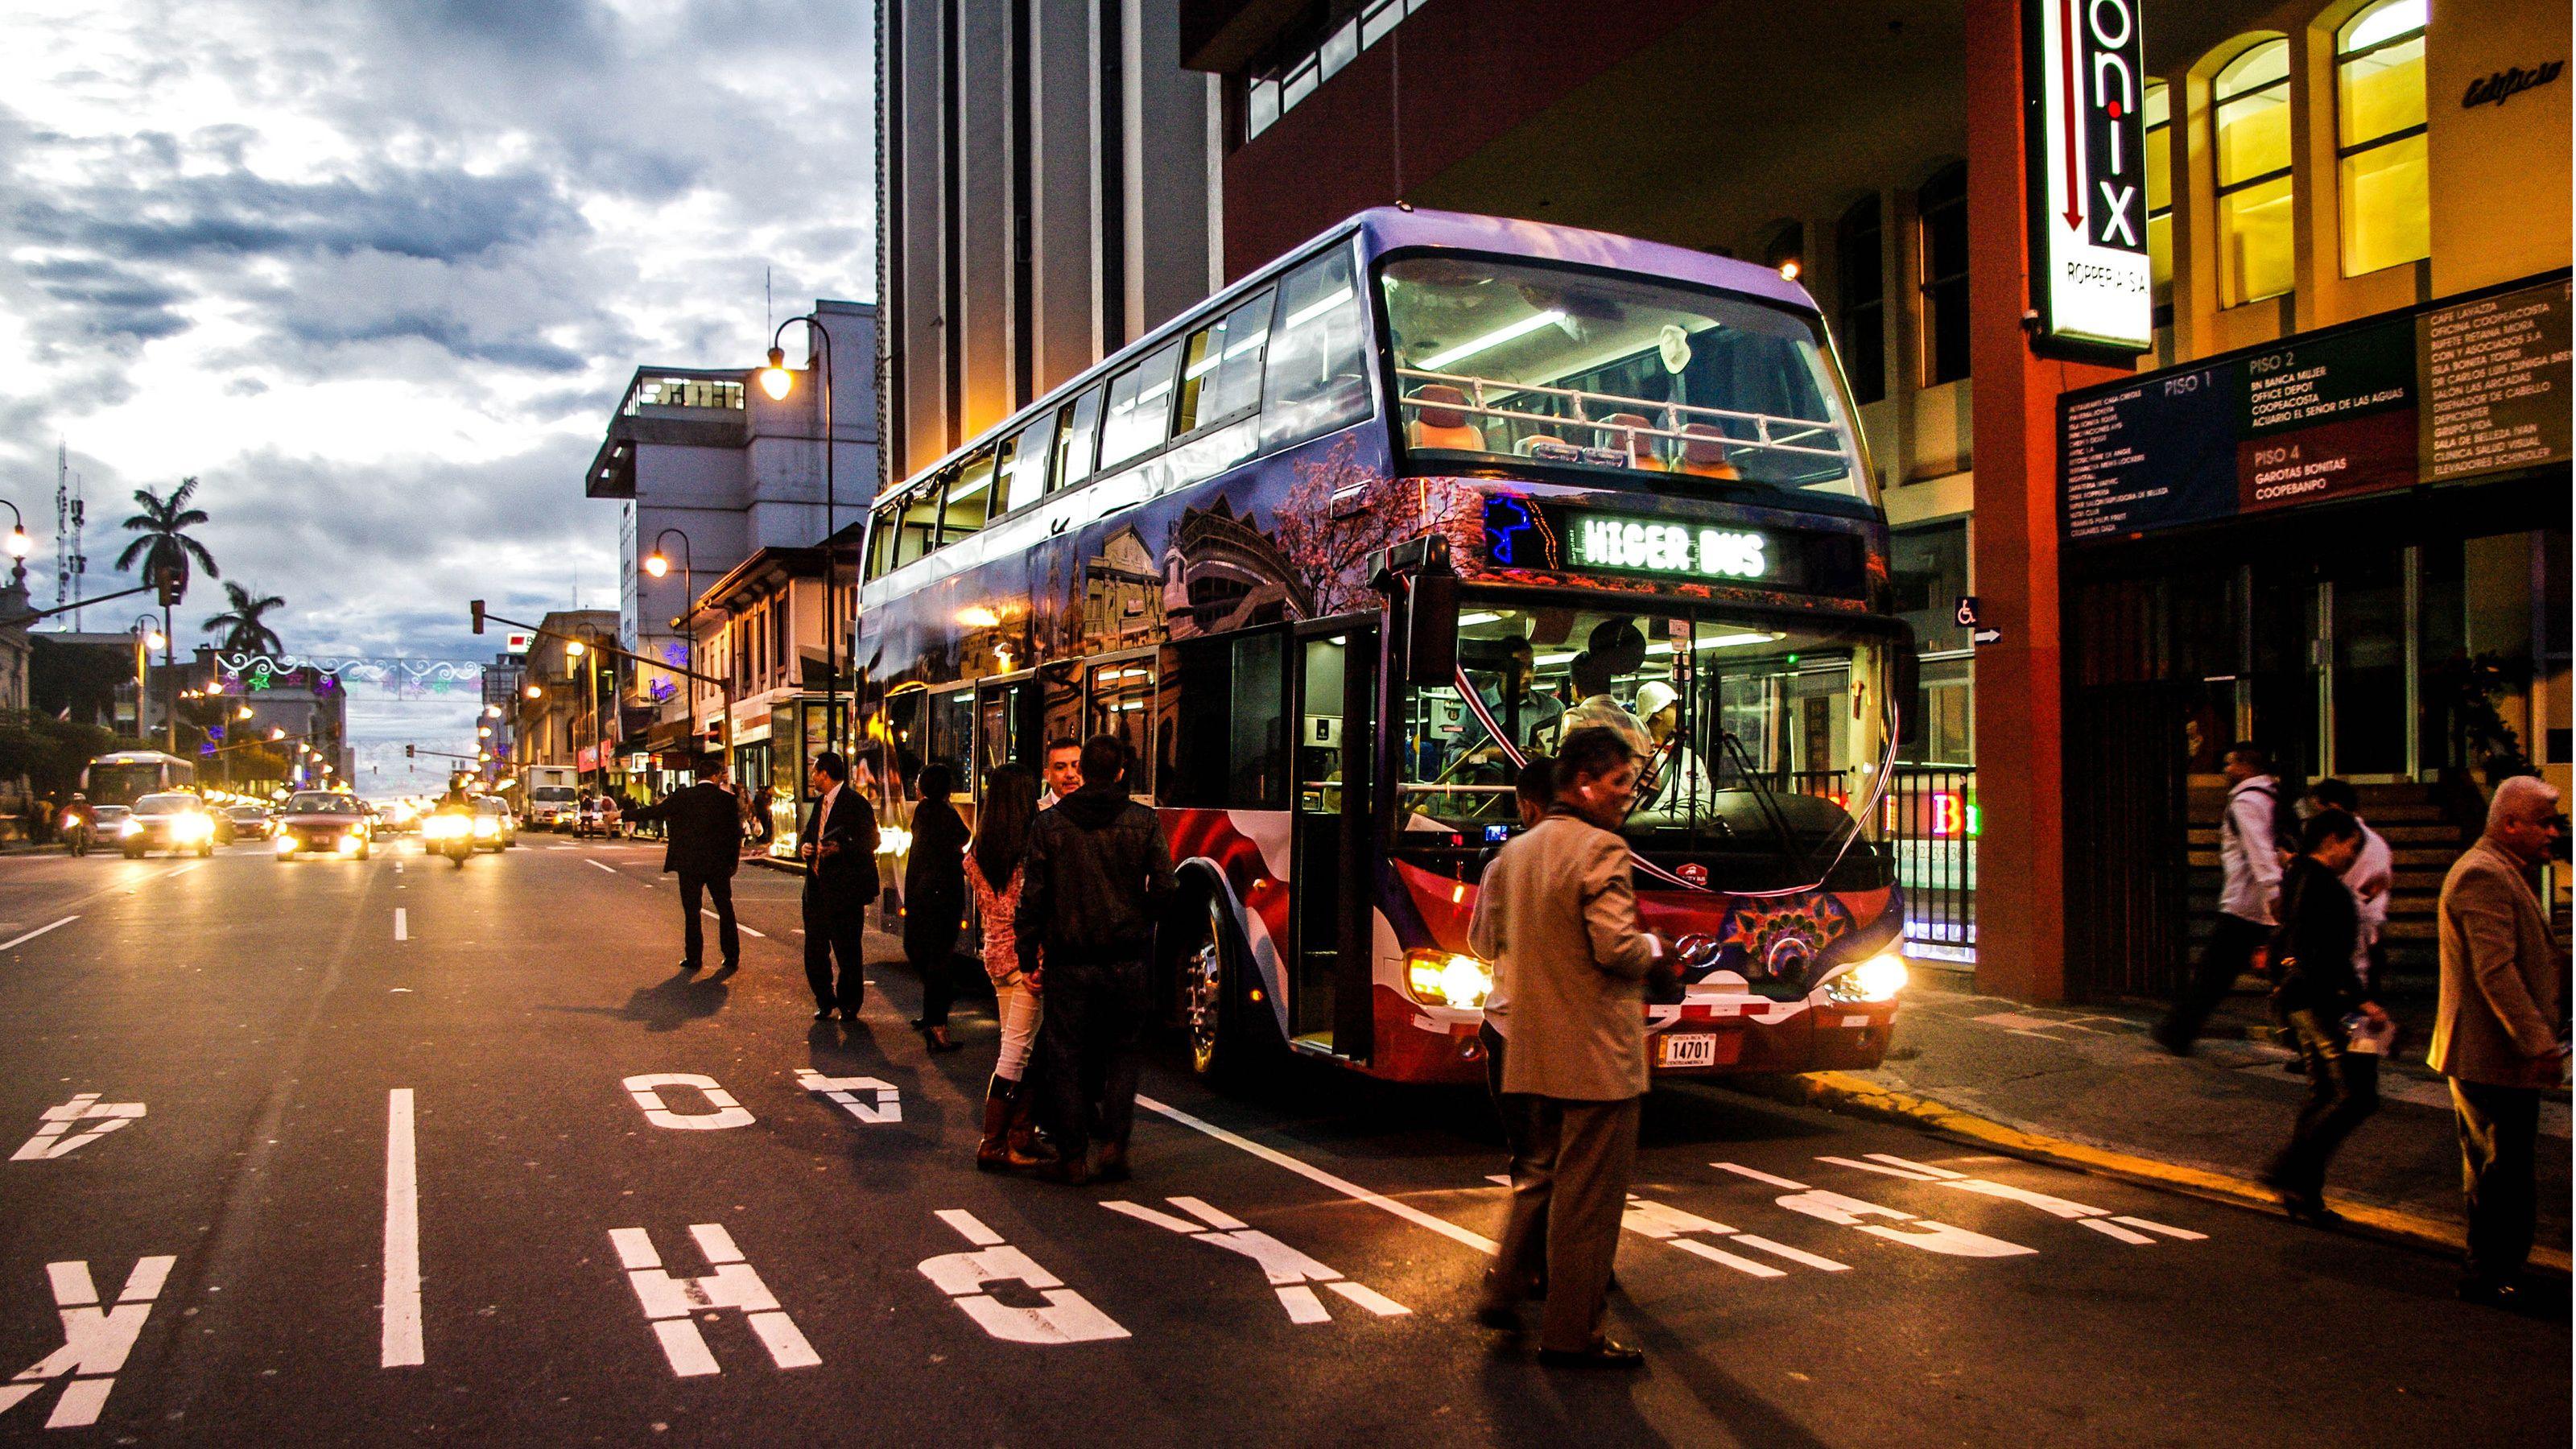 Double-decker VIP bus at night in San Jose